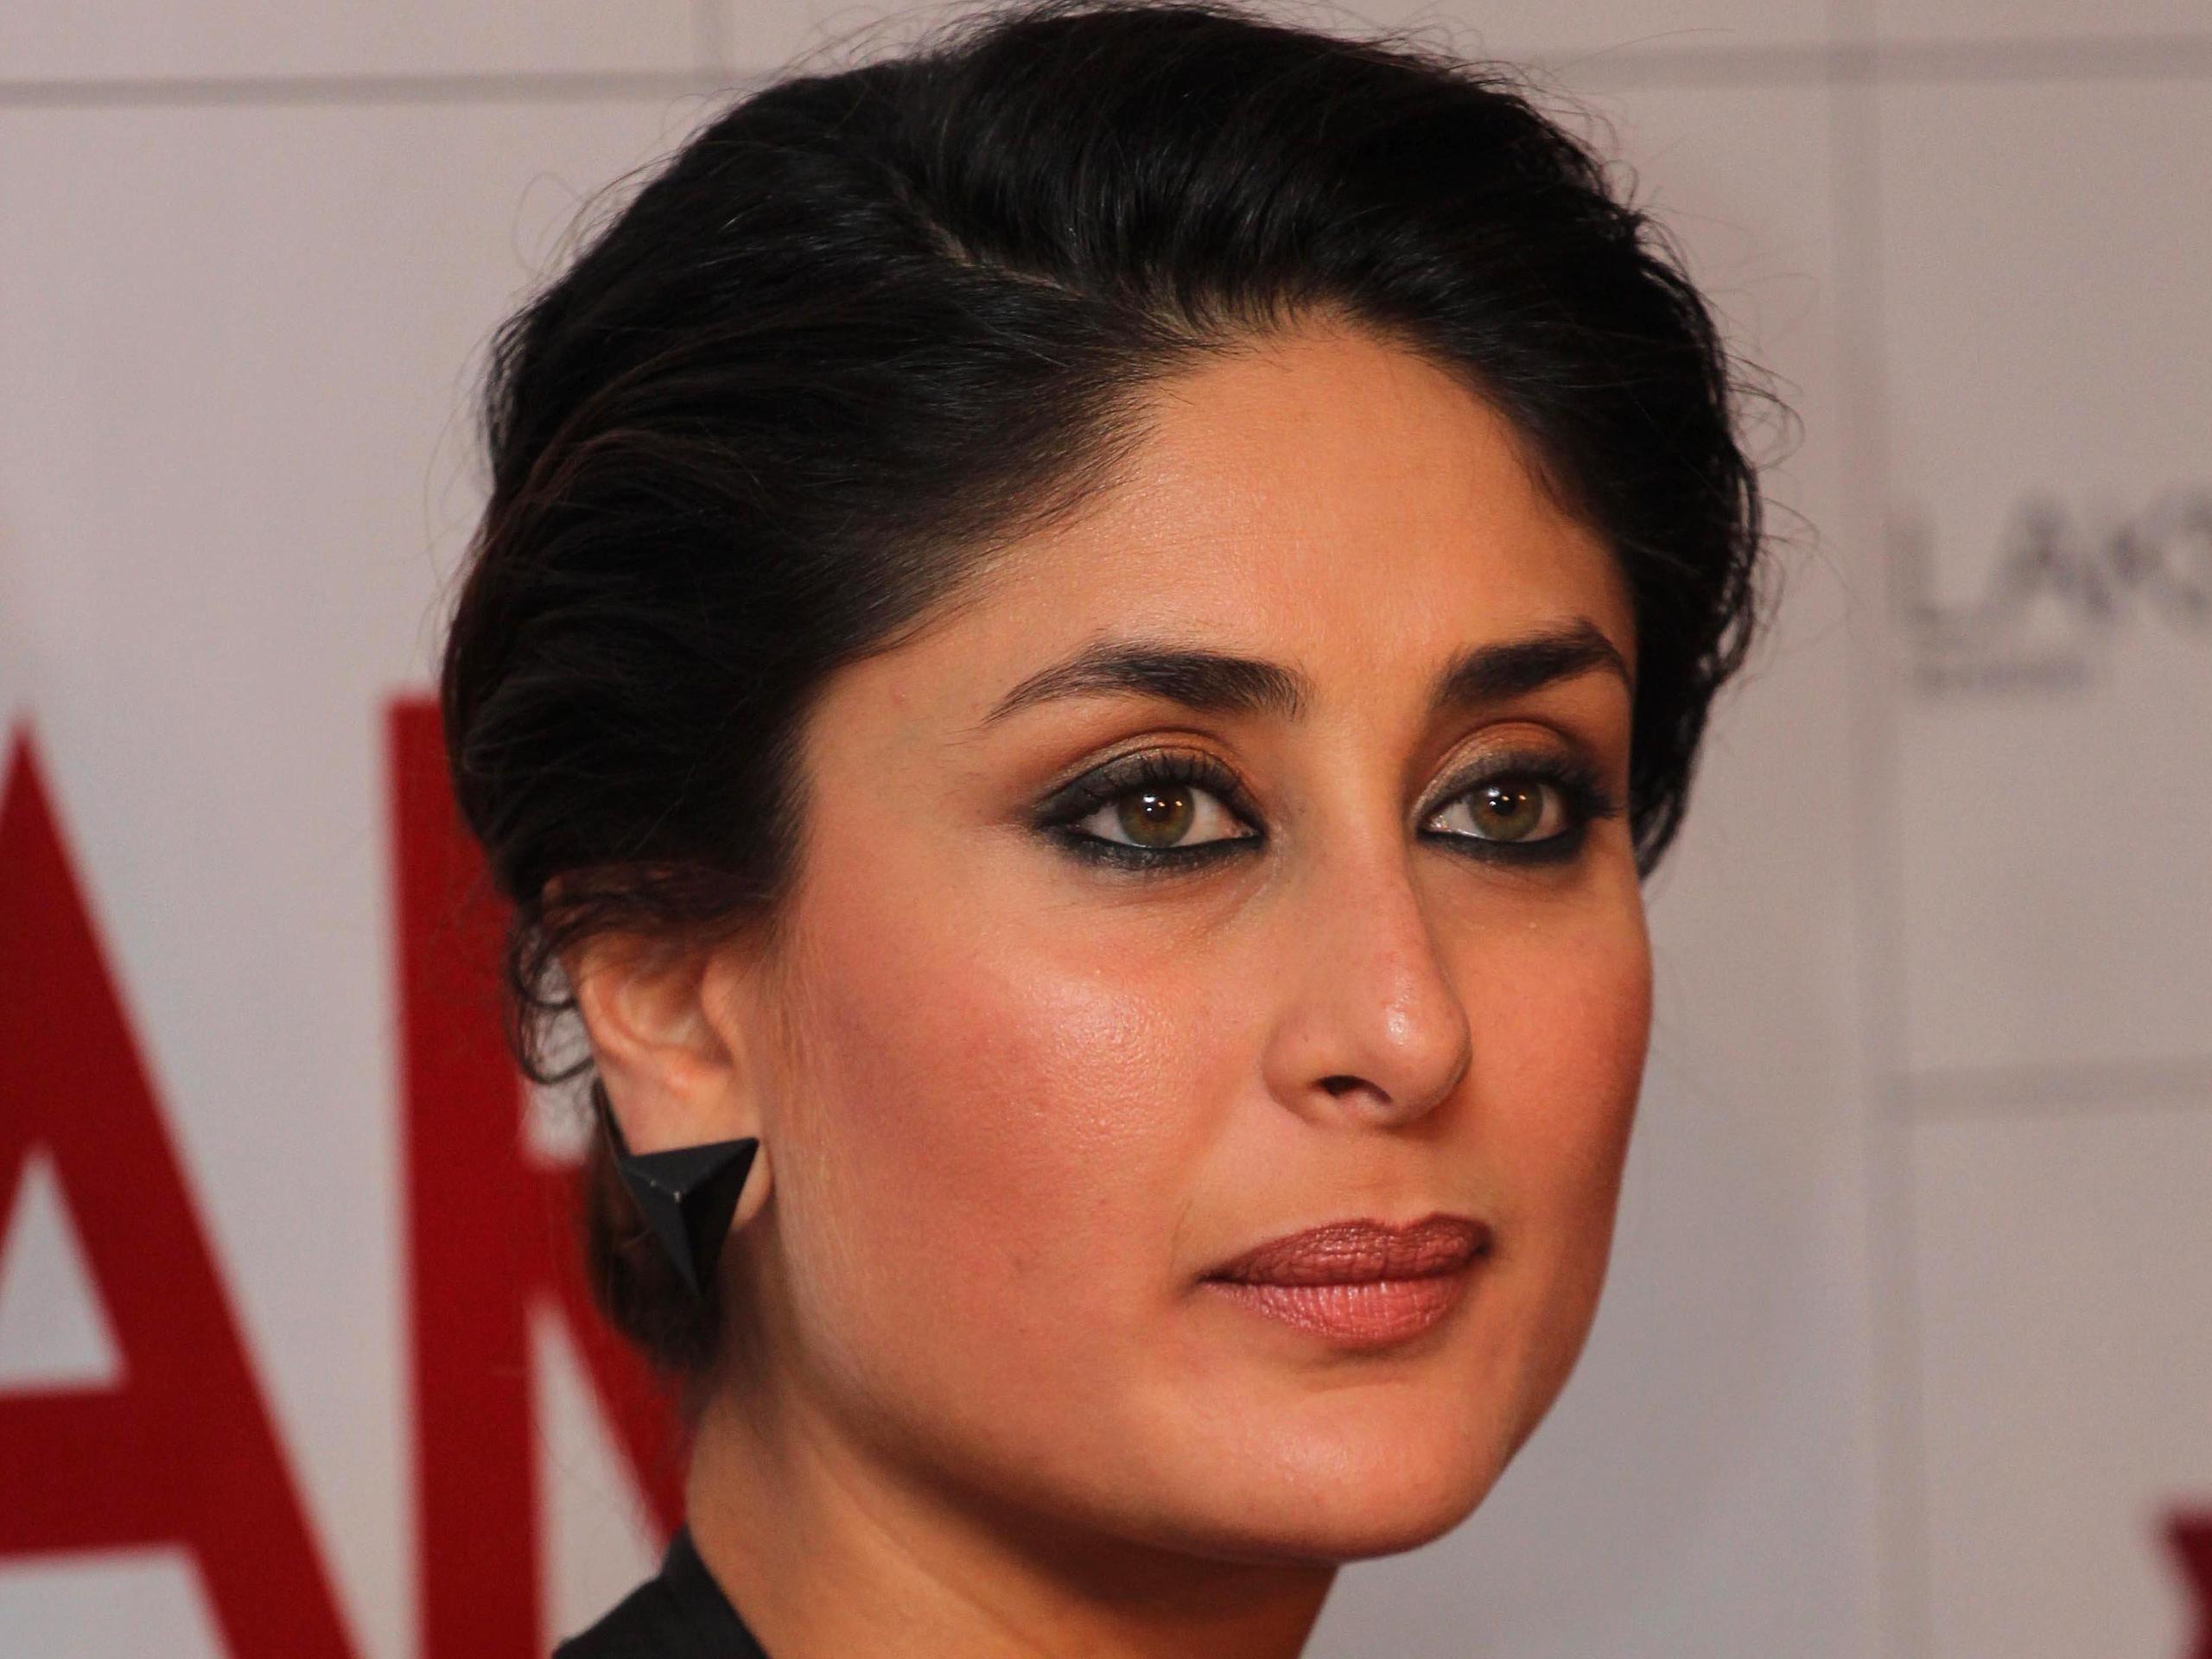 Kareena Kapoor's Beauty Secrets every girl should know ...